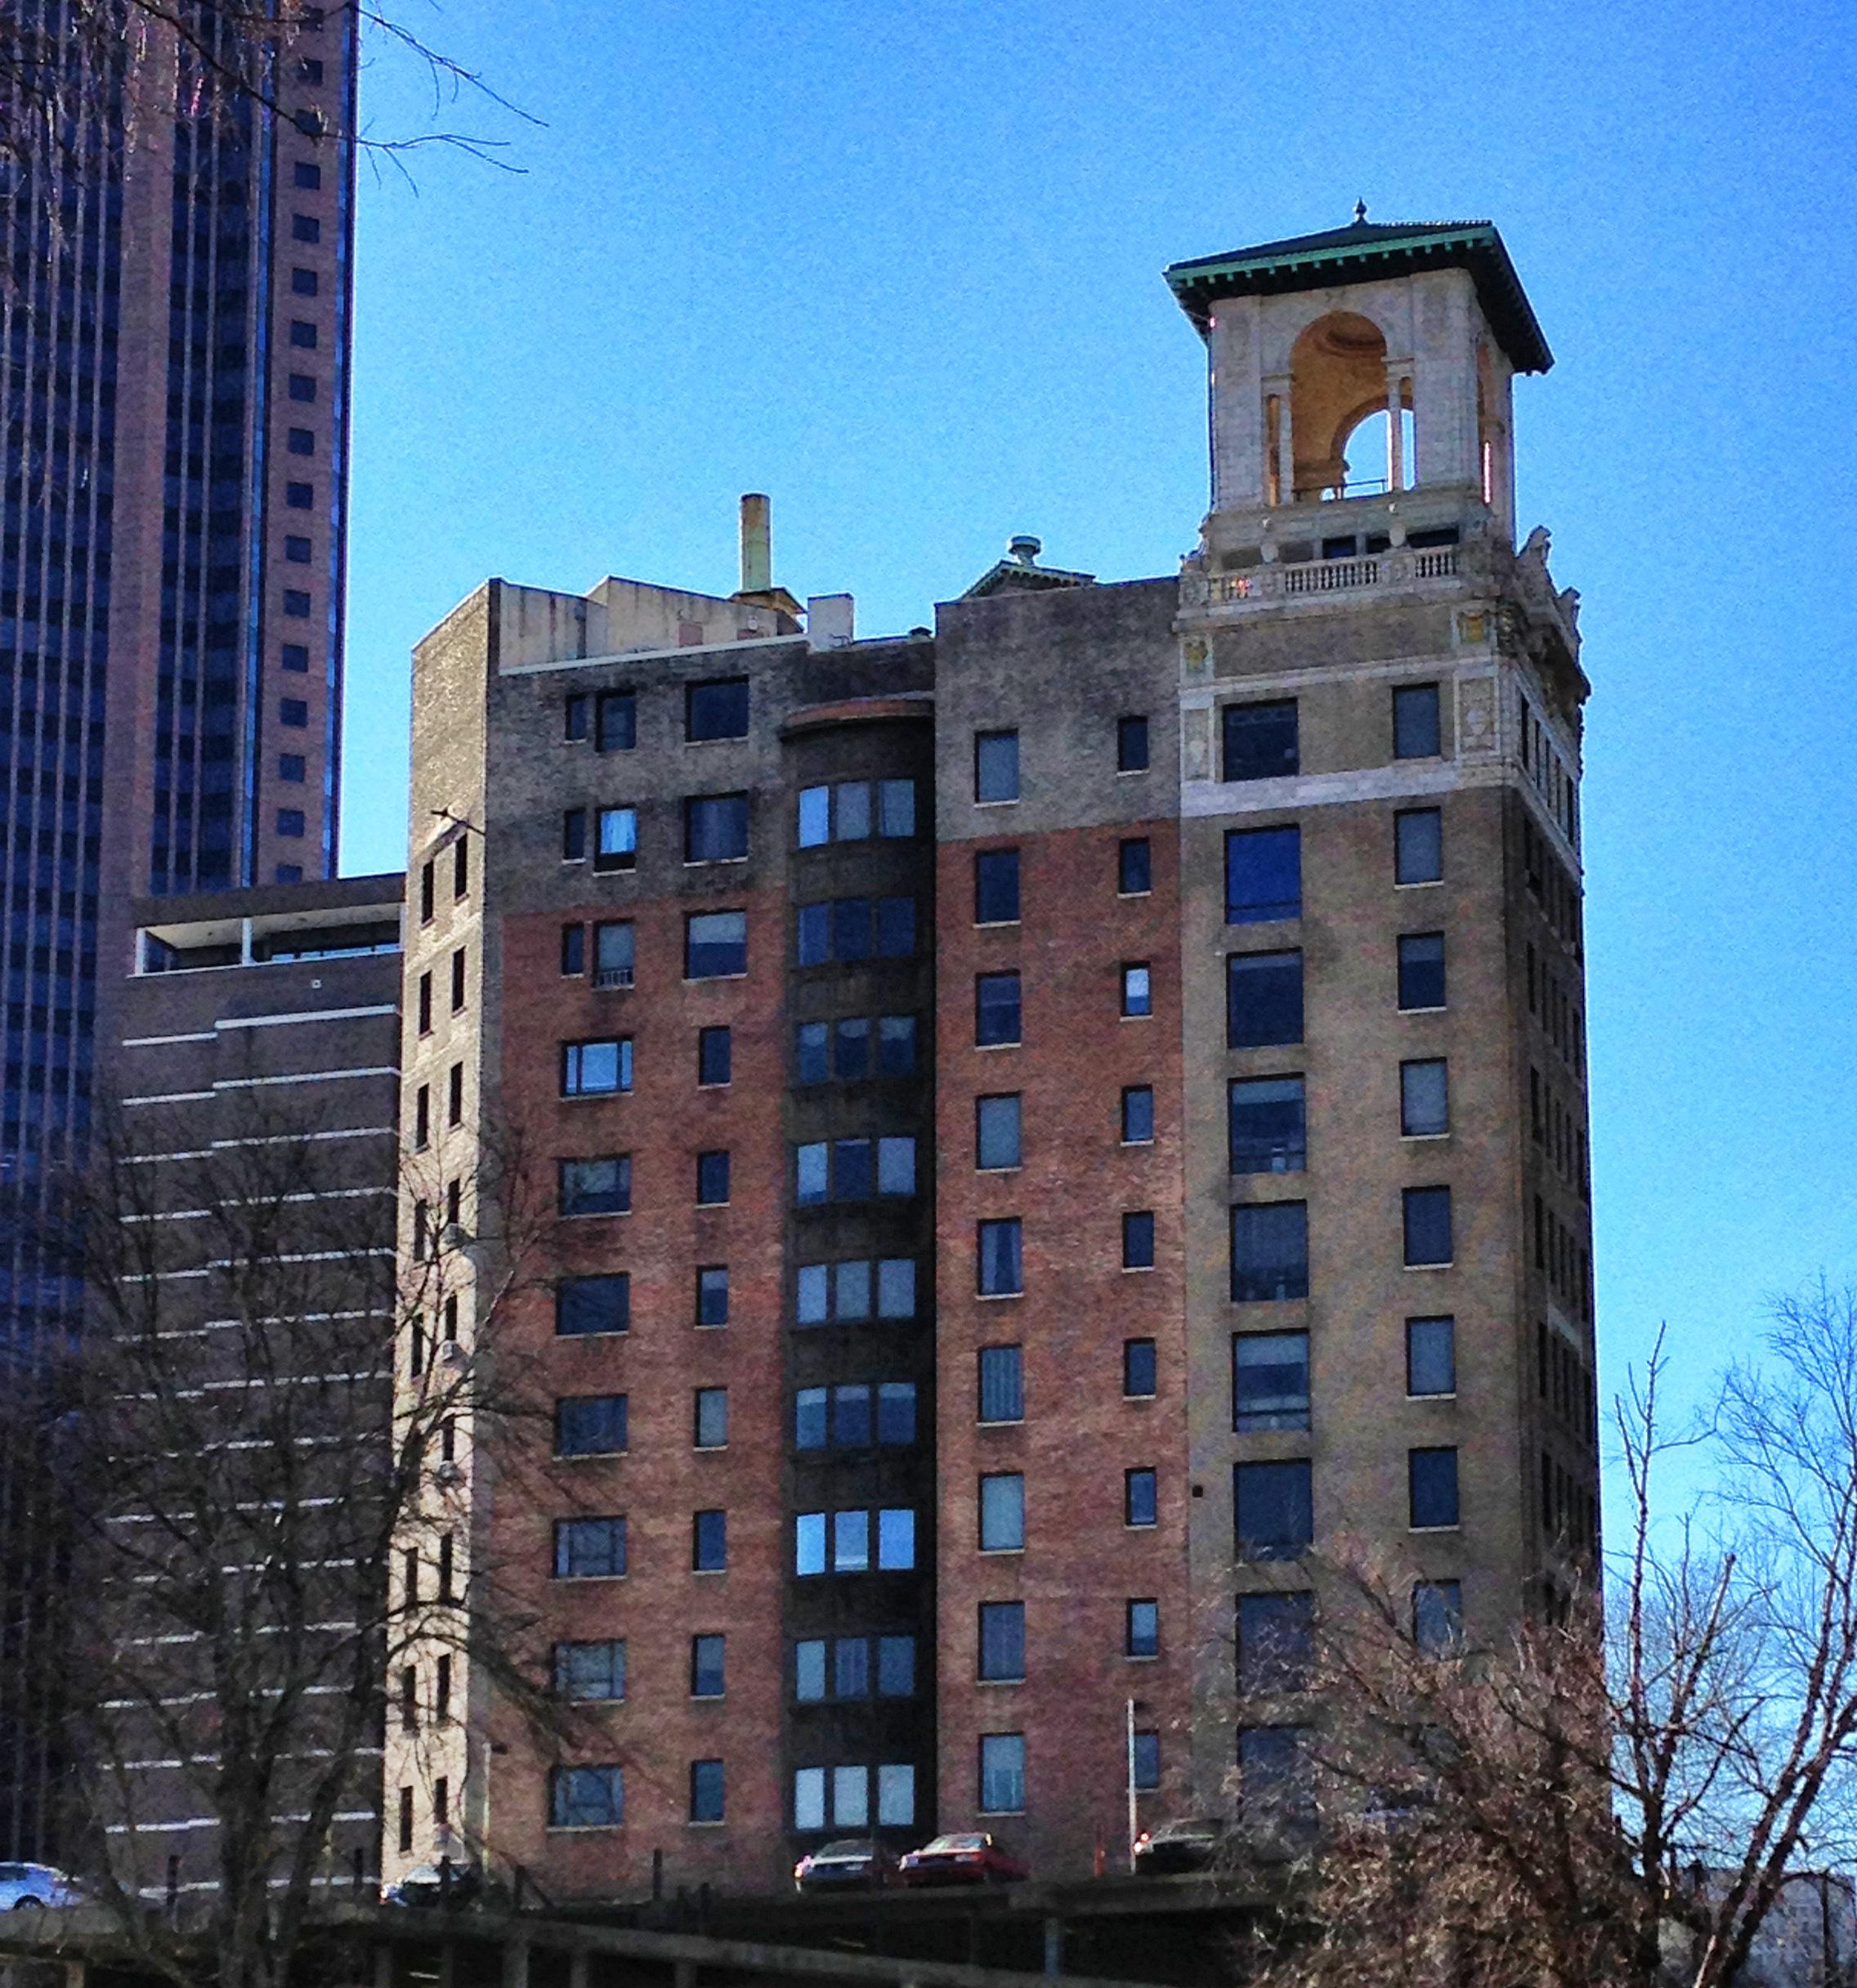 Apartments In Atlanta Ga Under 1200: File:Ponce De Leon Apartments (side View), Midtown Atlanta